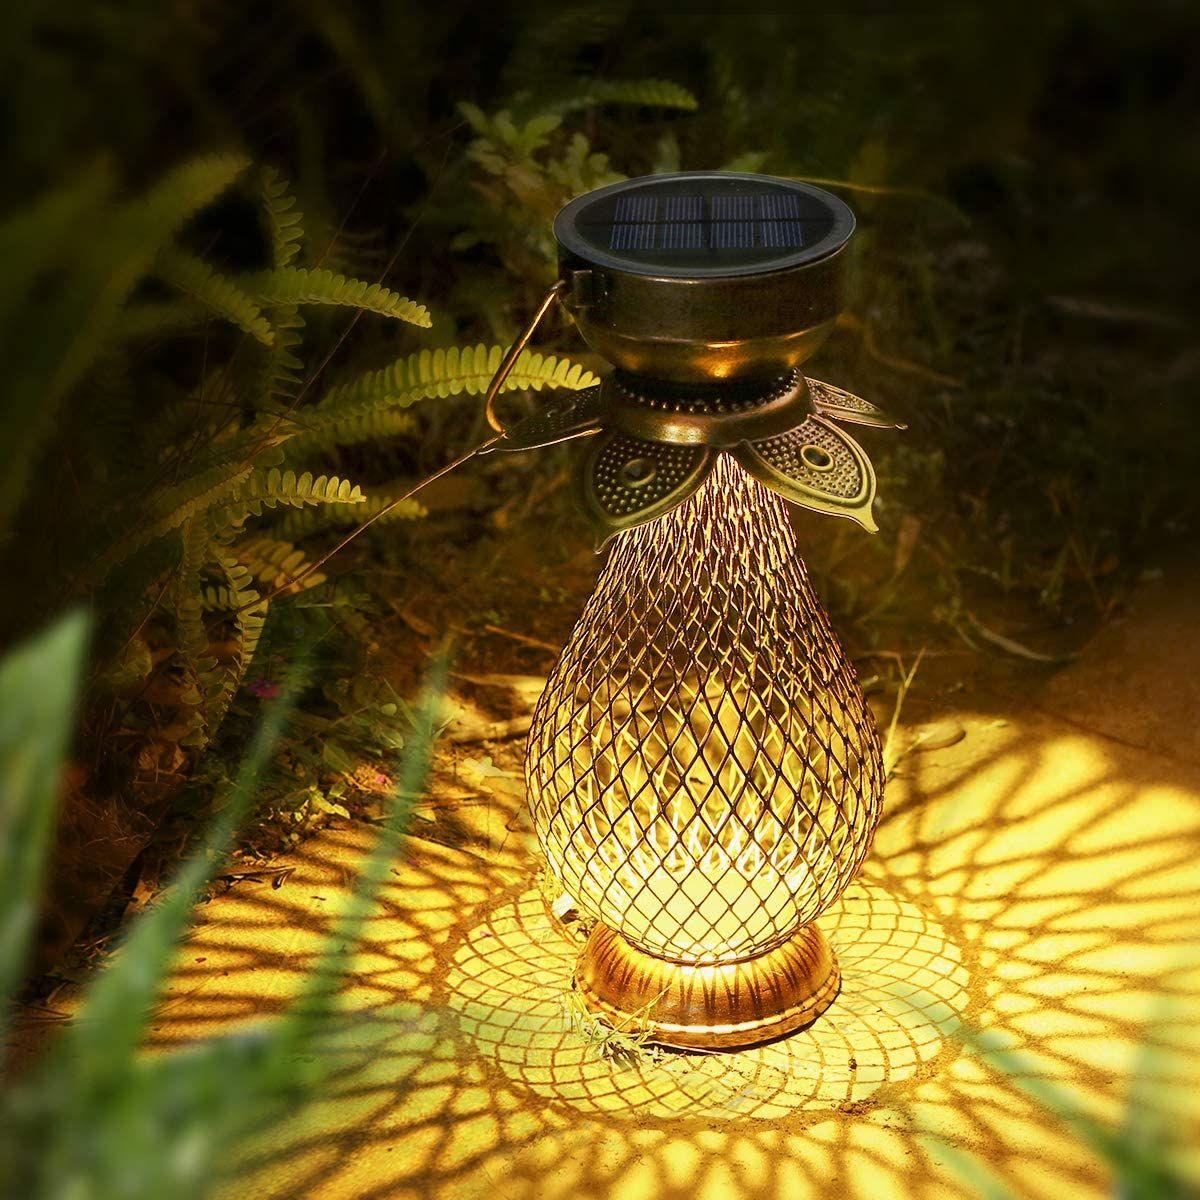 Solarlaterne Fur Aussen Gorvitor Led Retro Dekorative Solarlampe Garten Laterne Solarlaterne Hangend Ip44 Wasser Laterne Garten Solarlampen Garten Solarlampe